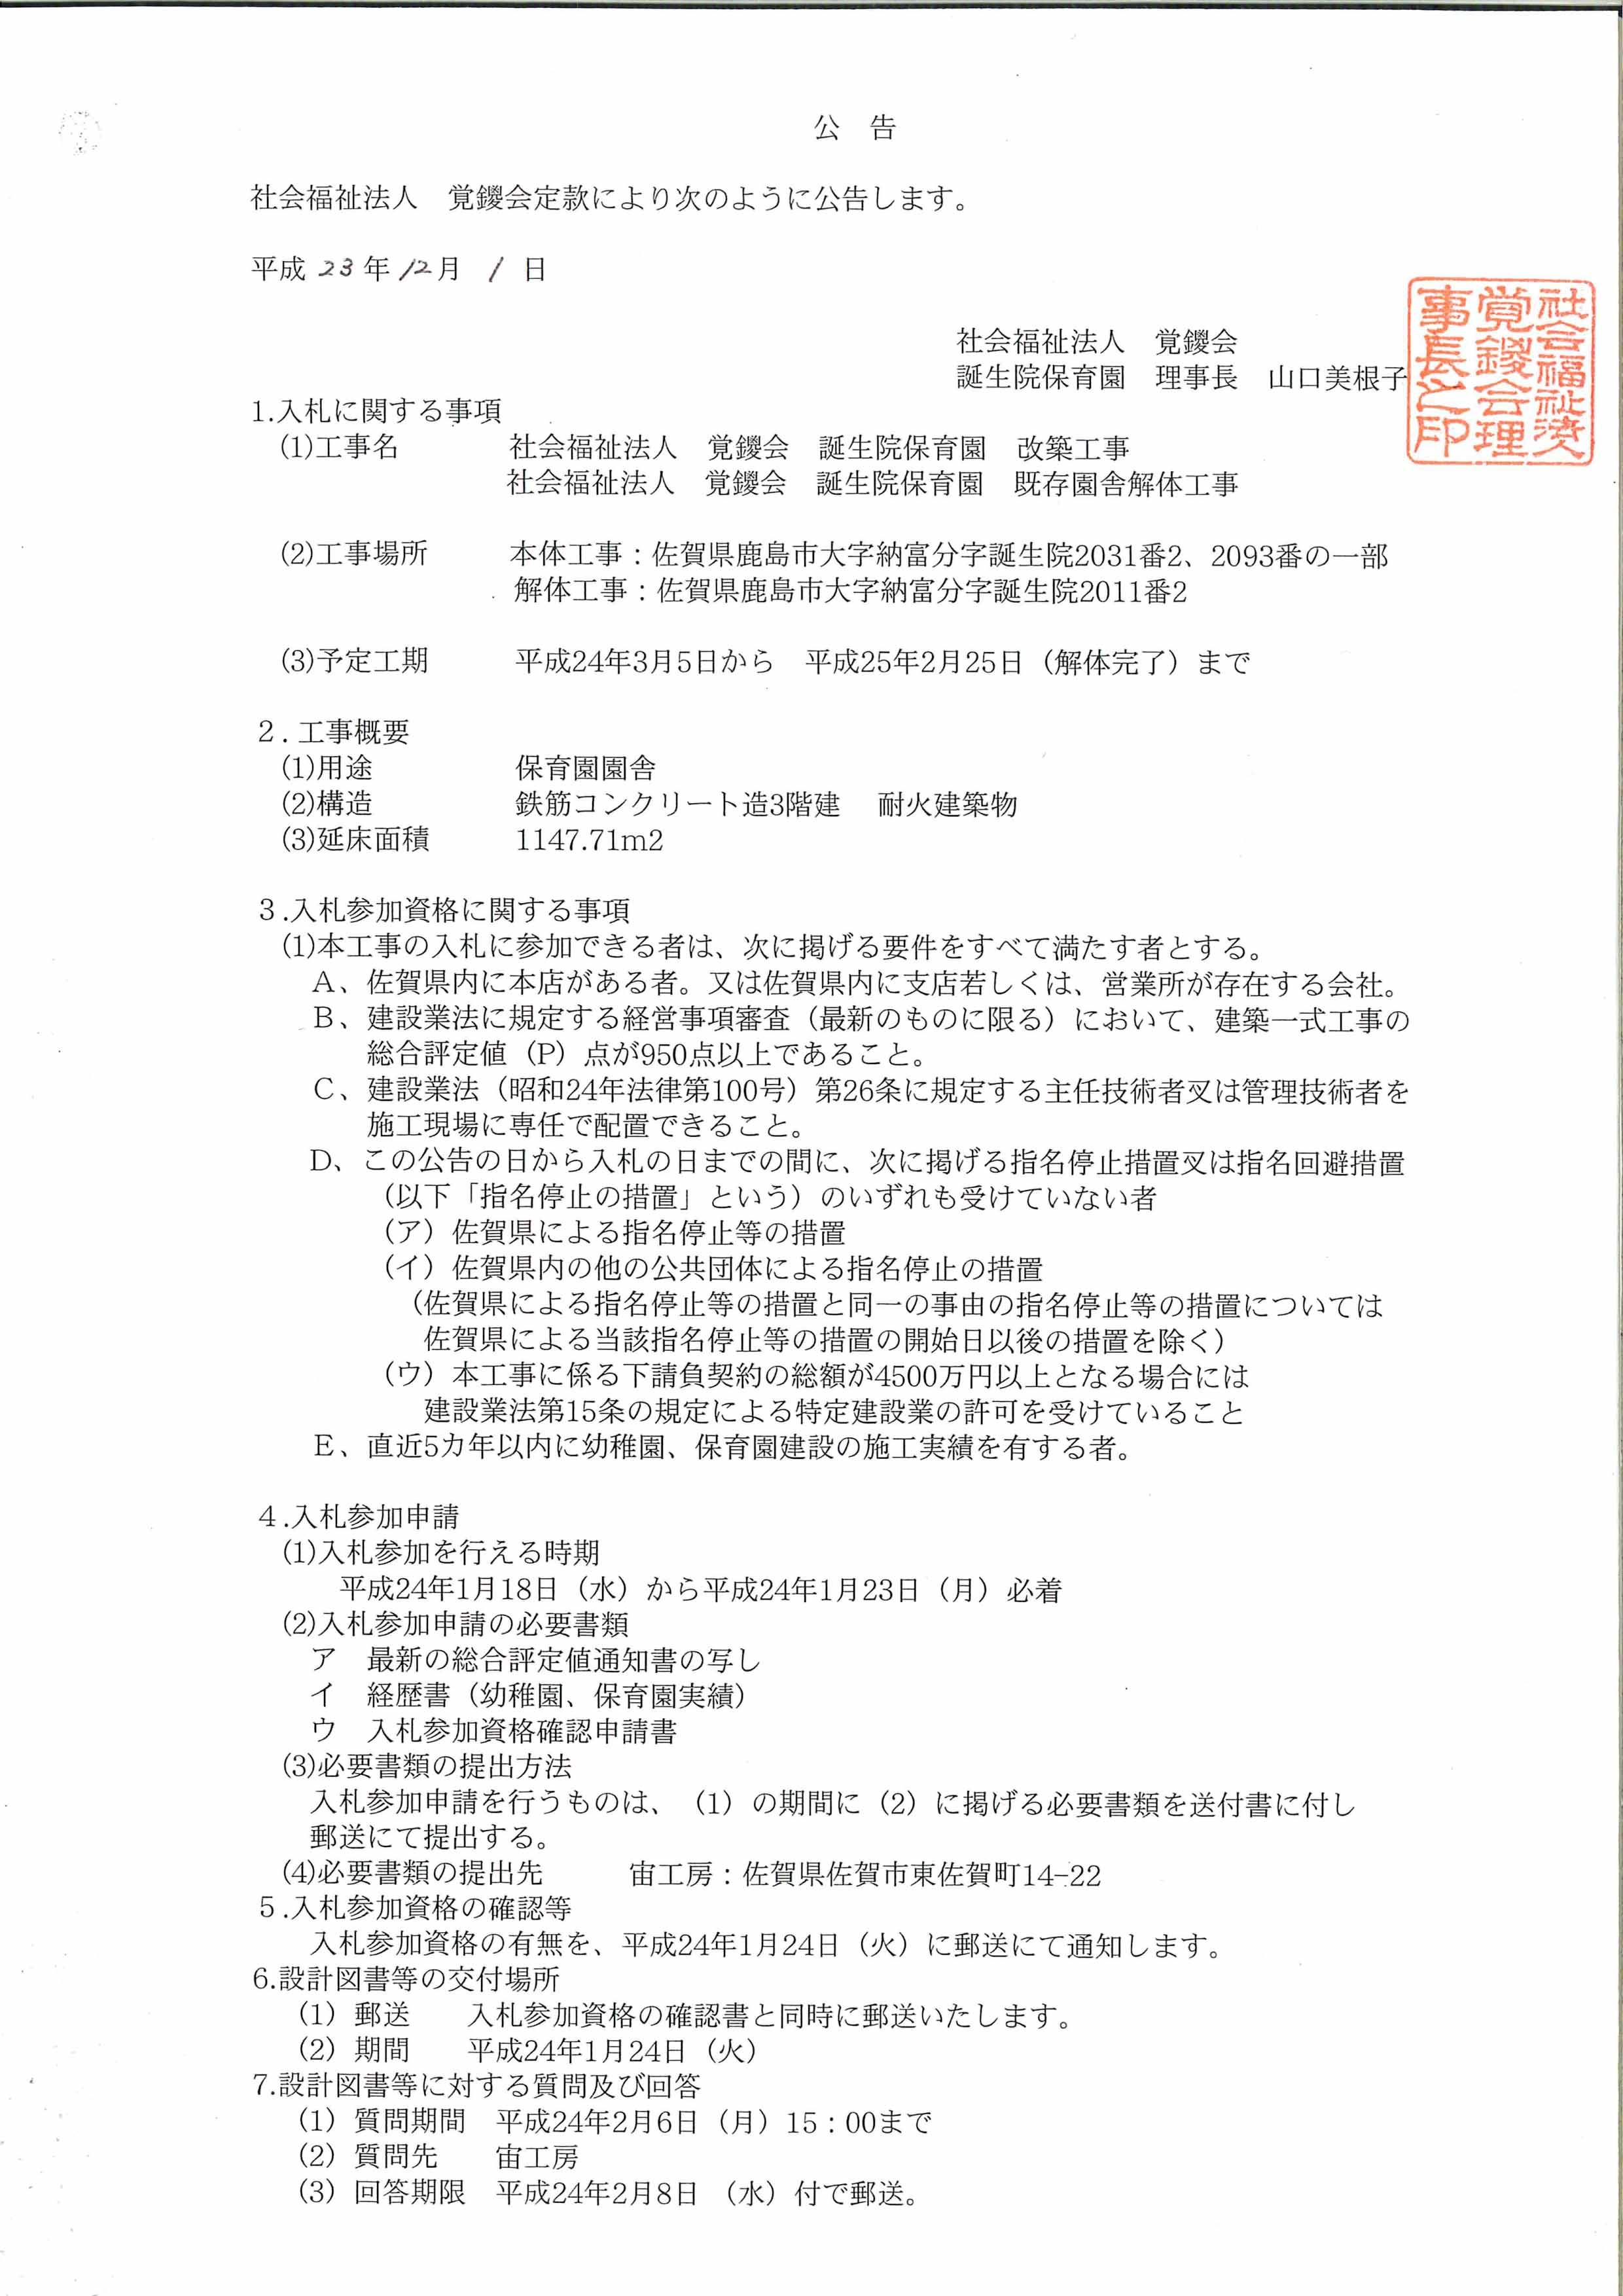 誕生院保育園園舎建設工事に関する公告終了_c0091507_82538100.jpg